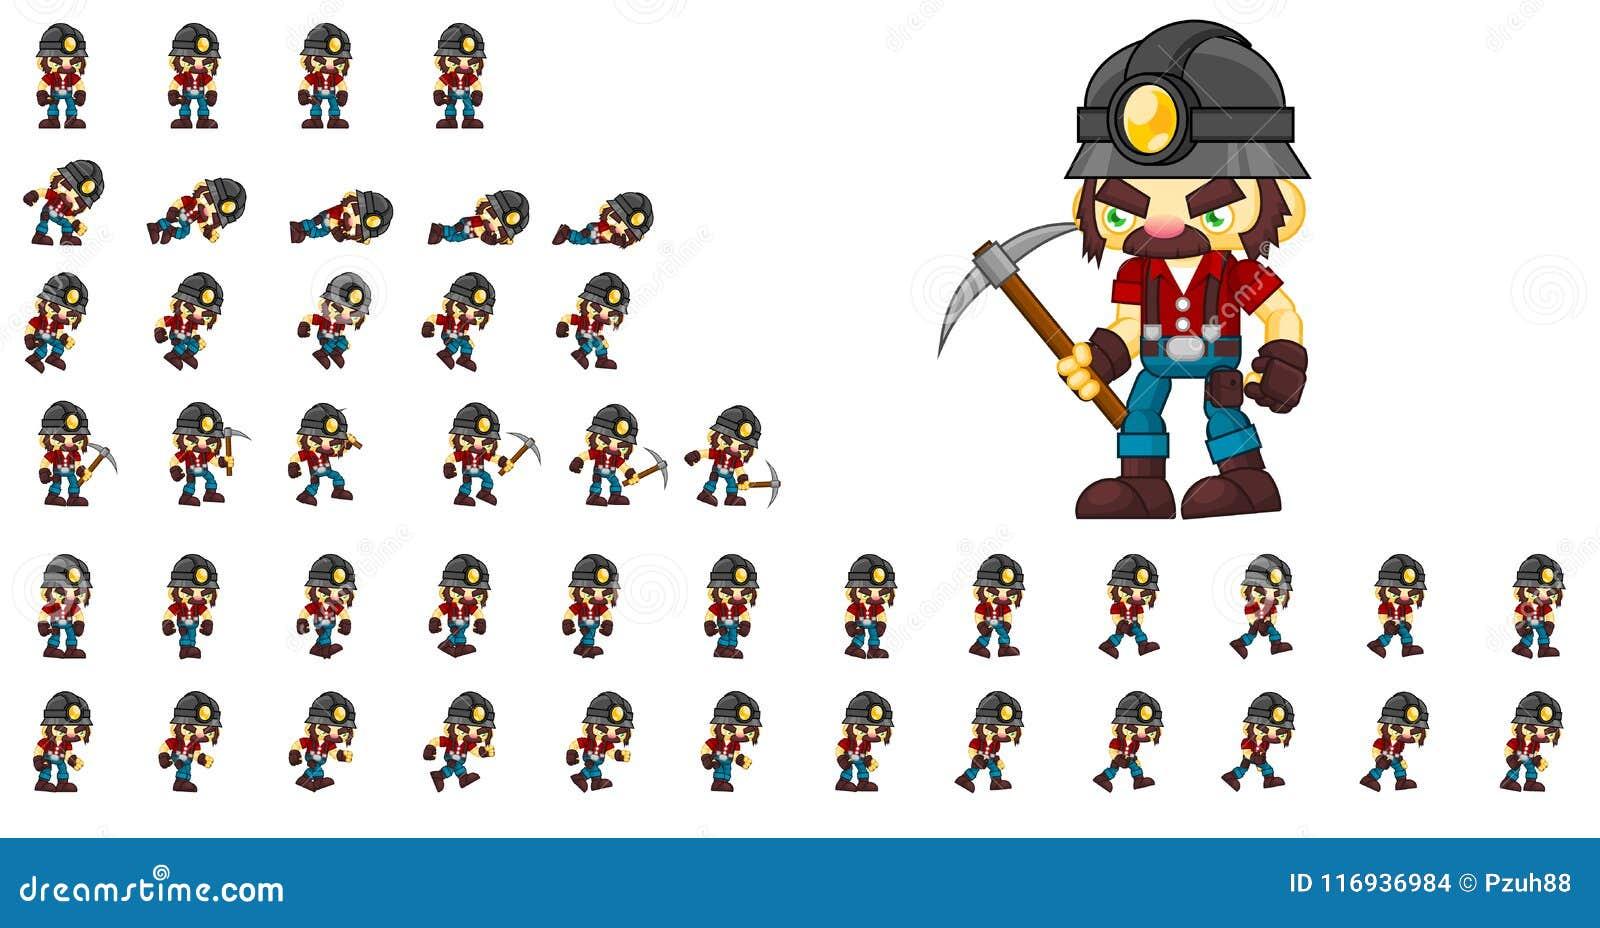 Mineiro animado Character Sprites